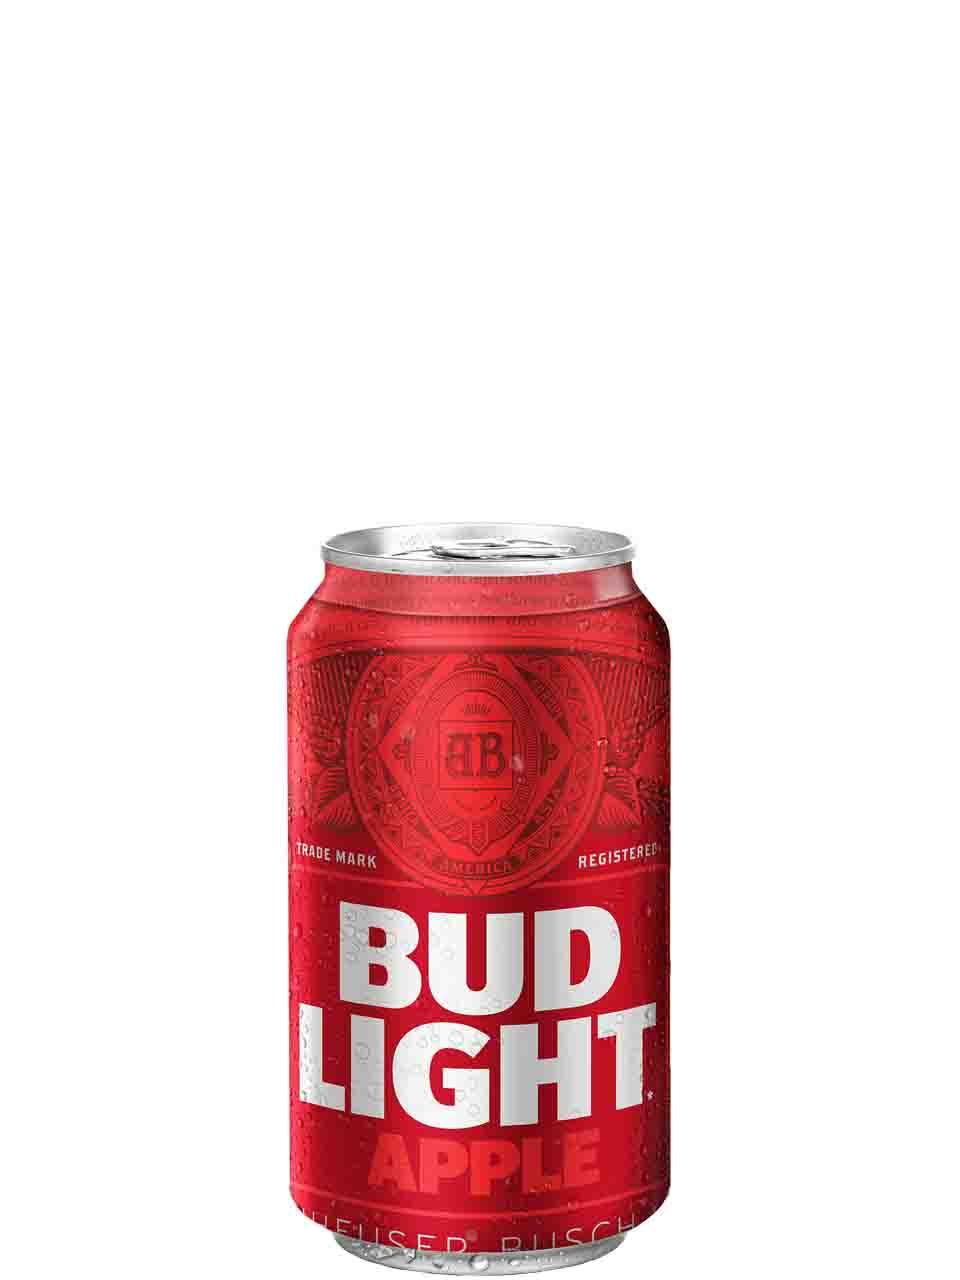 Bud Light Apple 12pk Cans